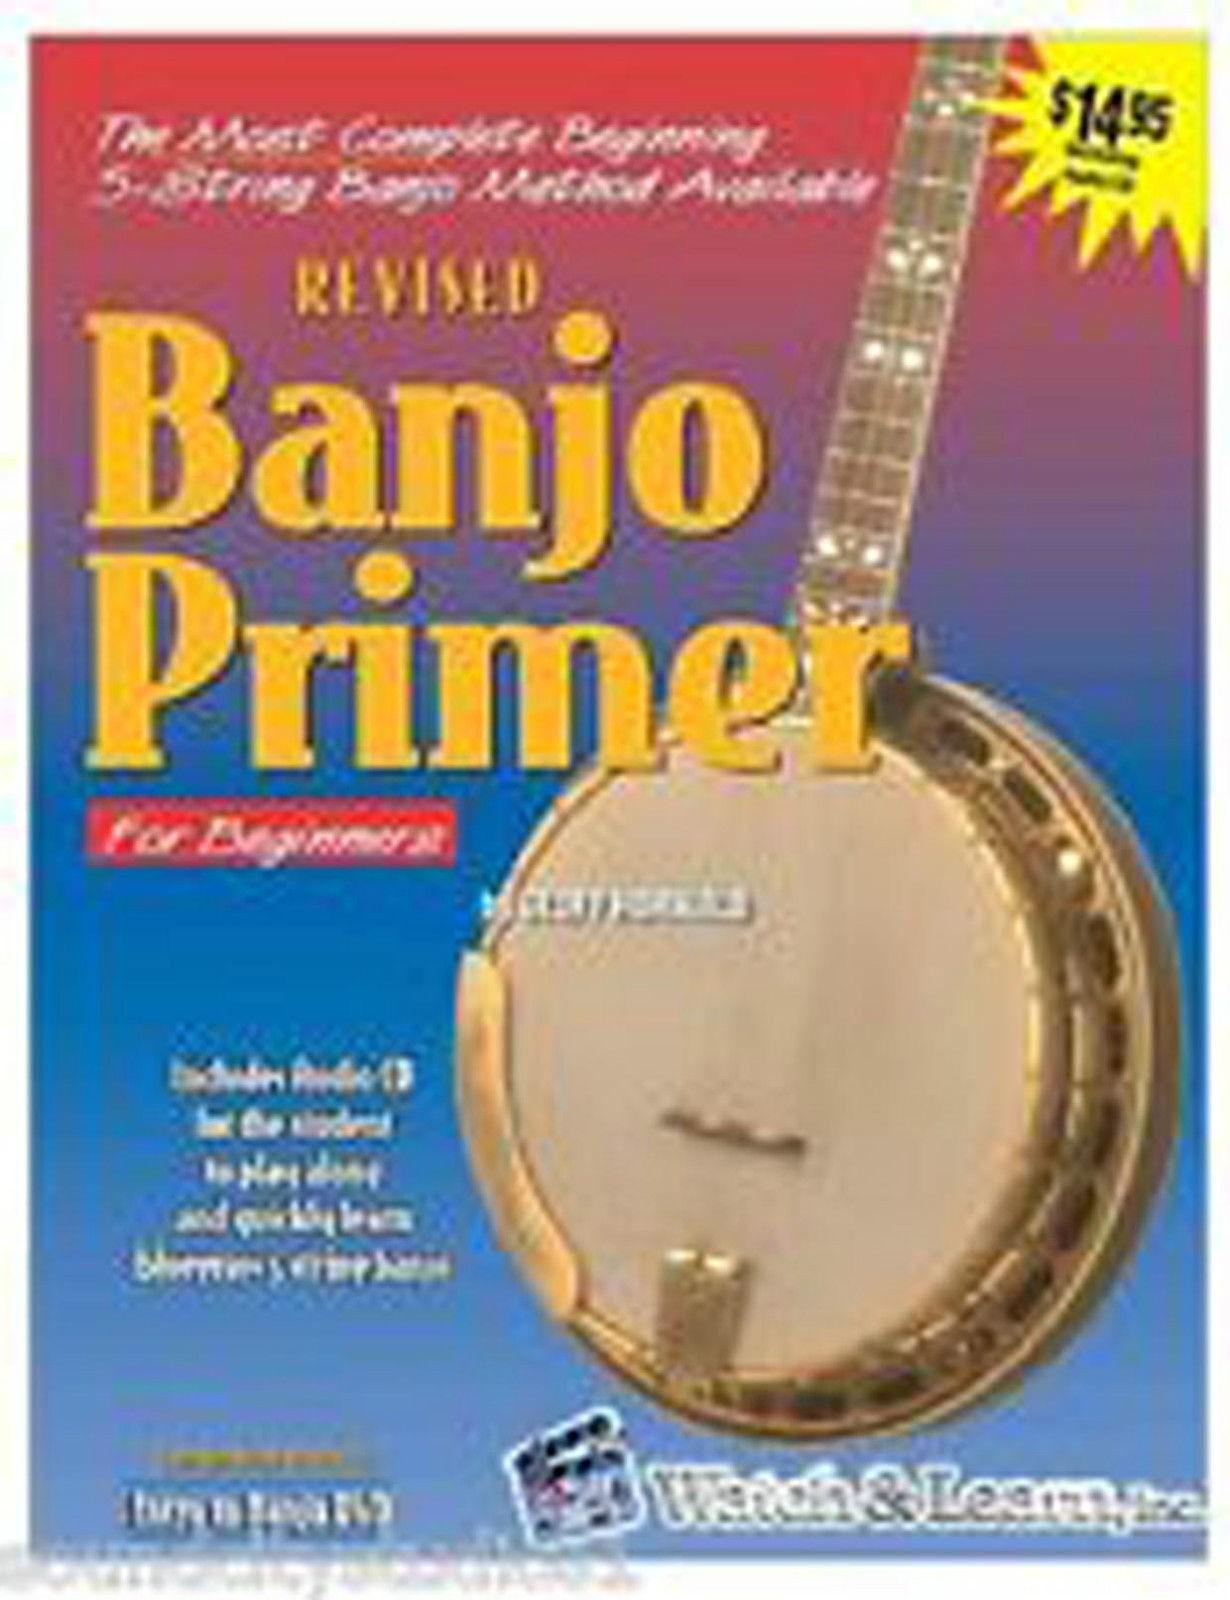 Banjo Primer Geoff Hohwald BooK CD Tutor Method Learn Beginner 5 String S127